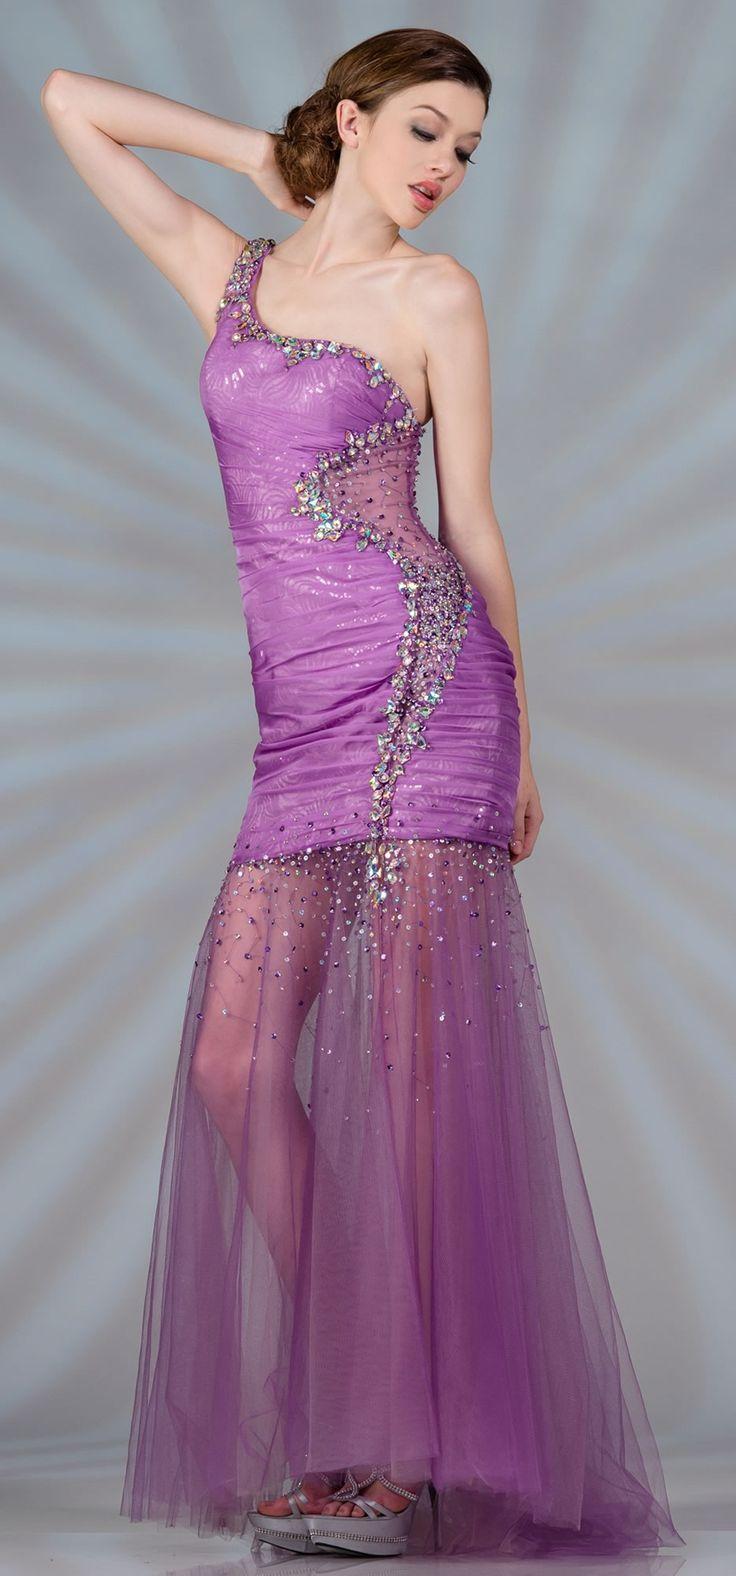 Magnífico Therosedresses.com Vestidos De Baile Viñeta - Vestido de ...